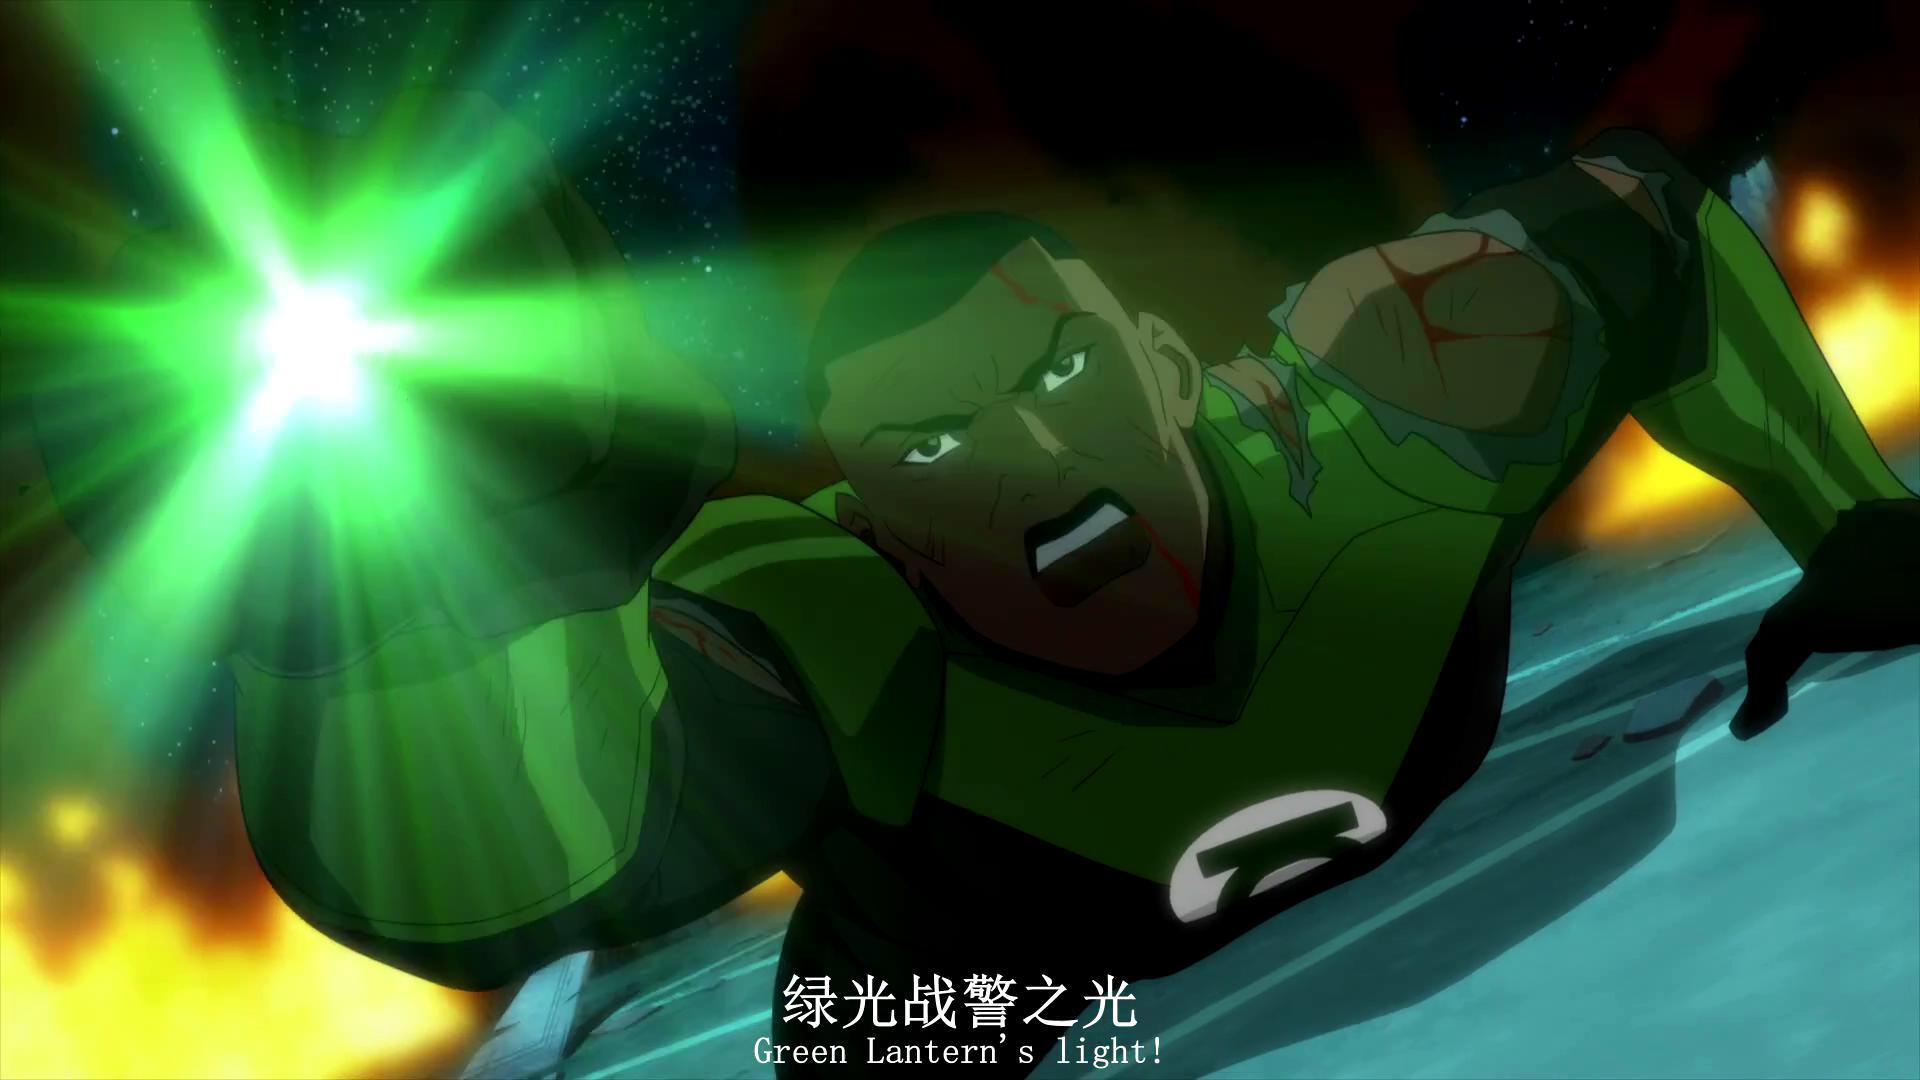 [BD影视分享bd-film.cc]黑暗正义联盟:天启星战争.Justice.League.Dark_.Apokolips.Wa.jpg